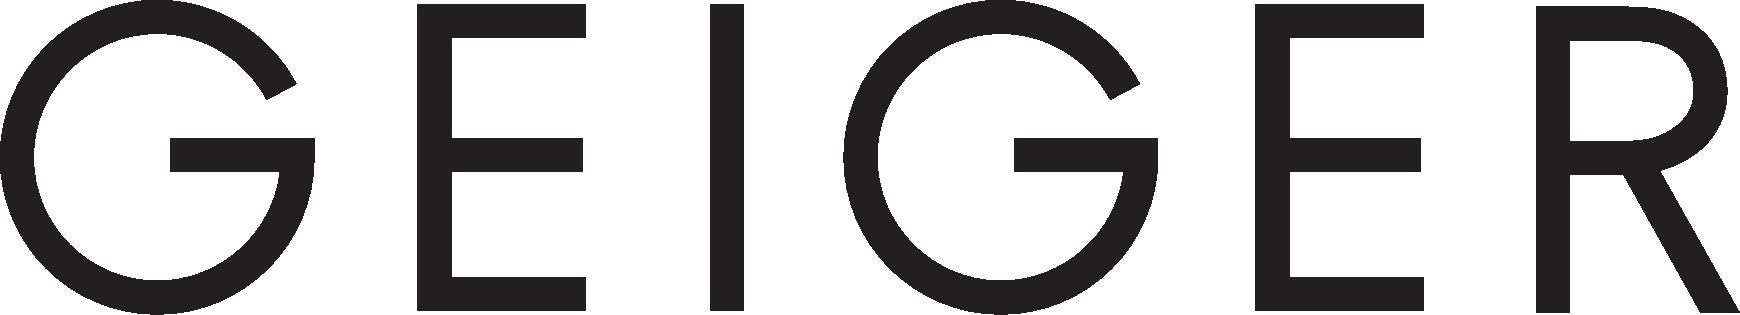 Geiger logo